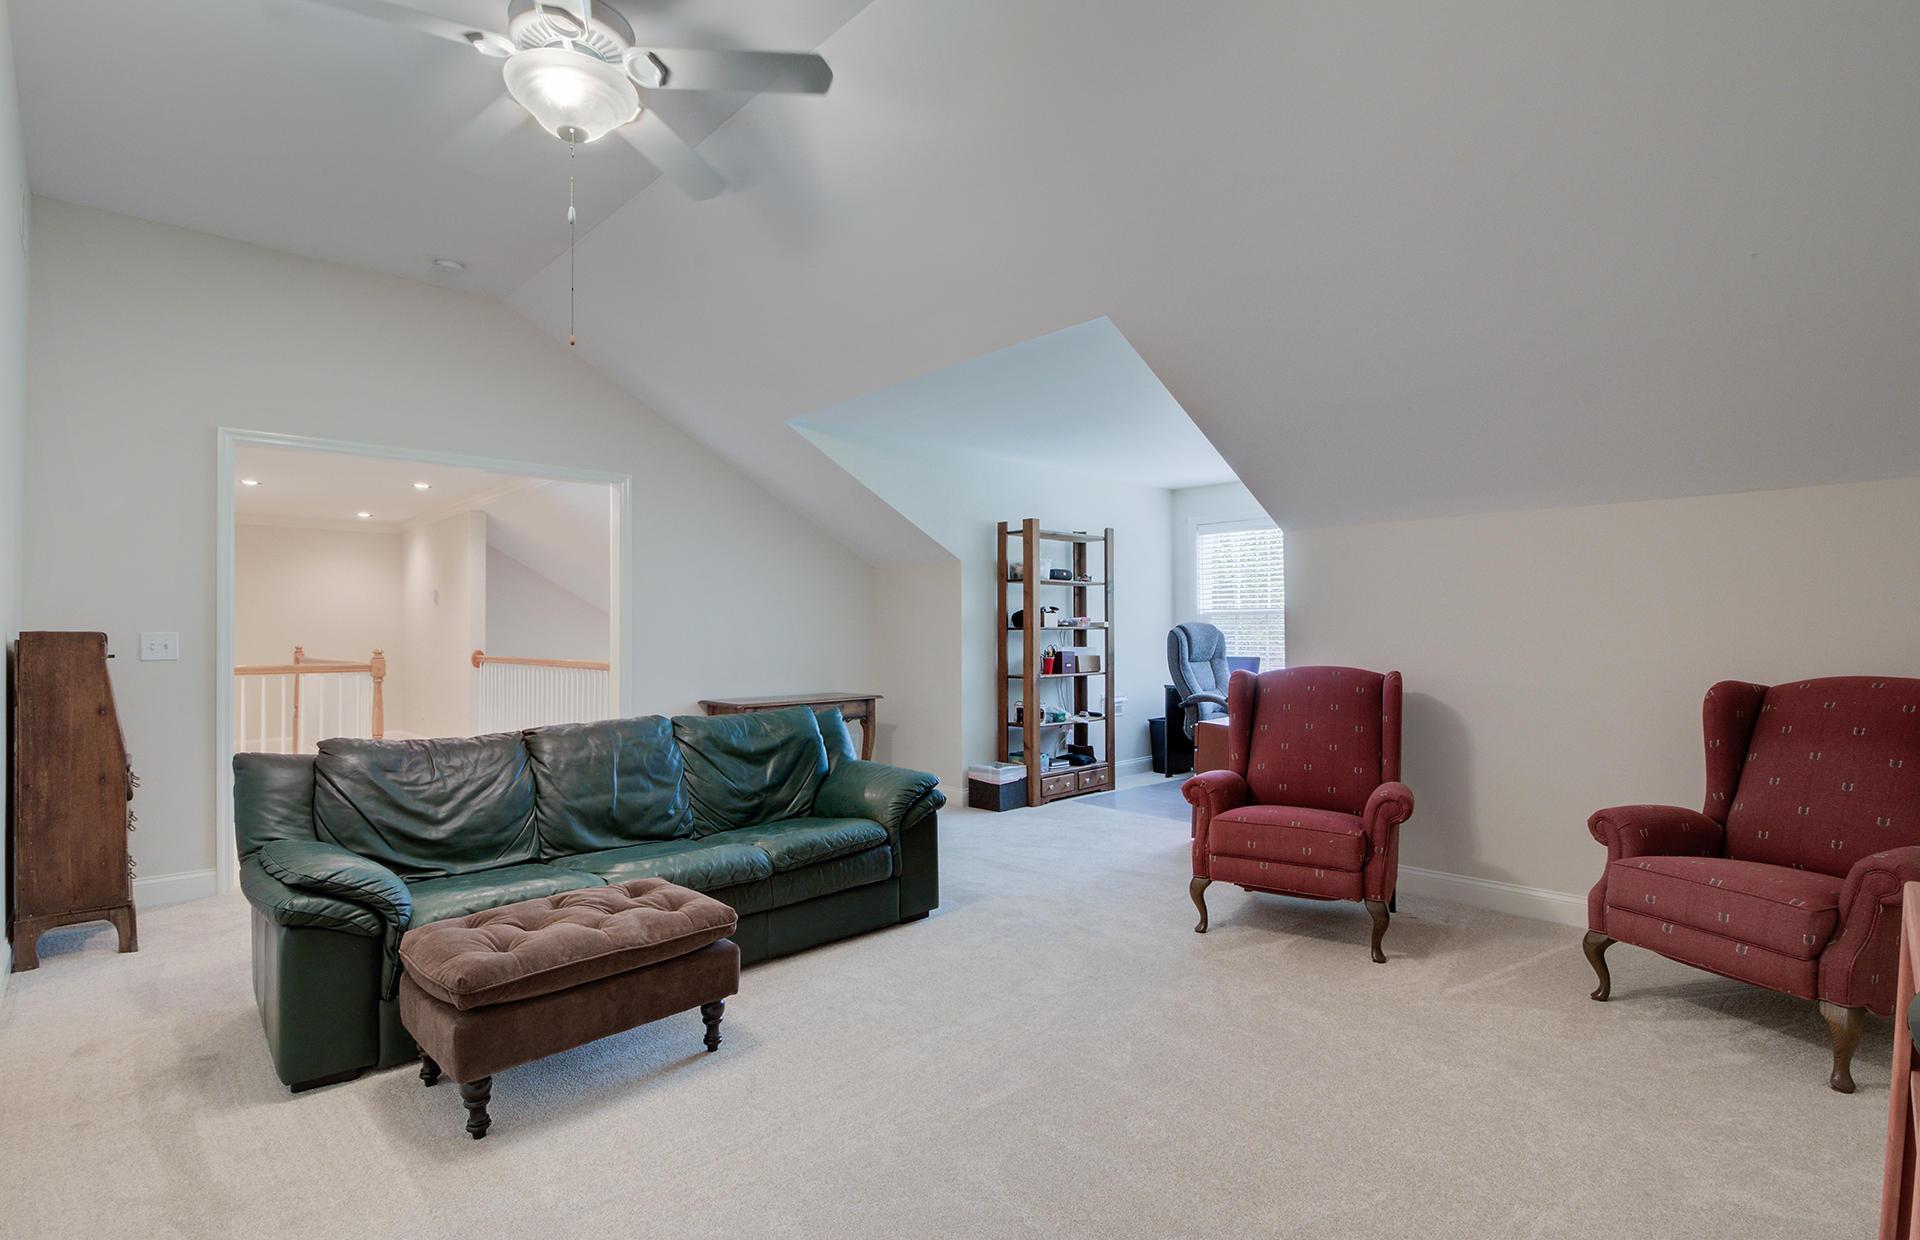 Dunes West Homes For Sale - 2453 Darts Cove, Mount Pleasant, SC - 20